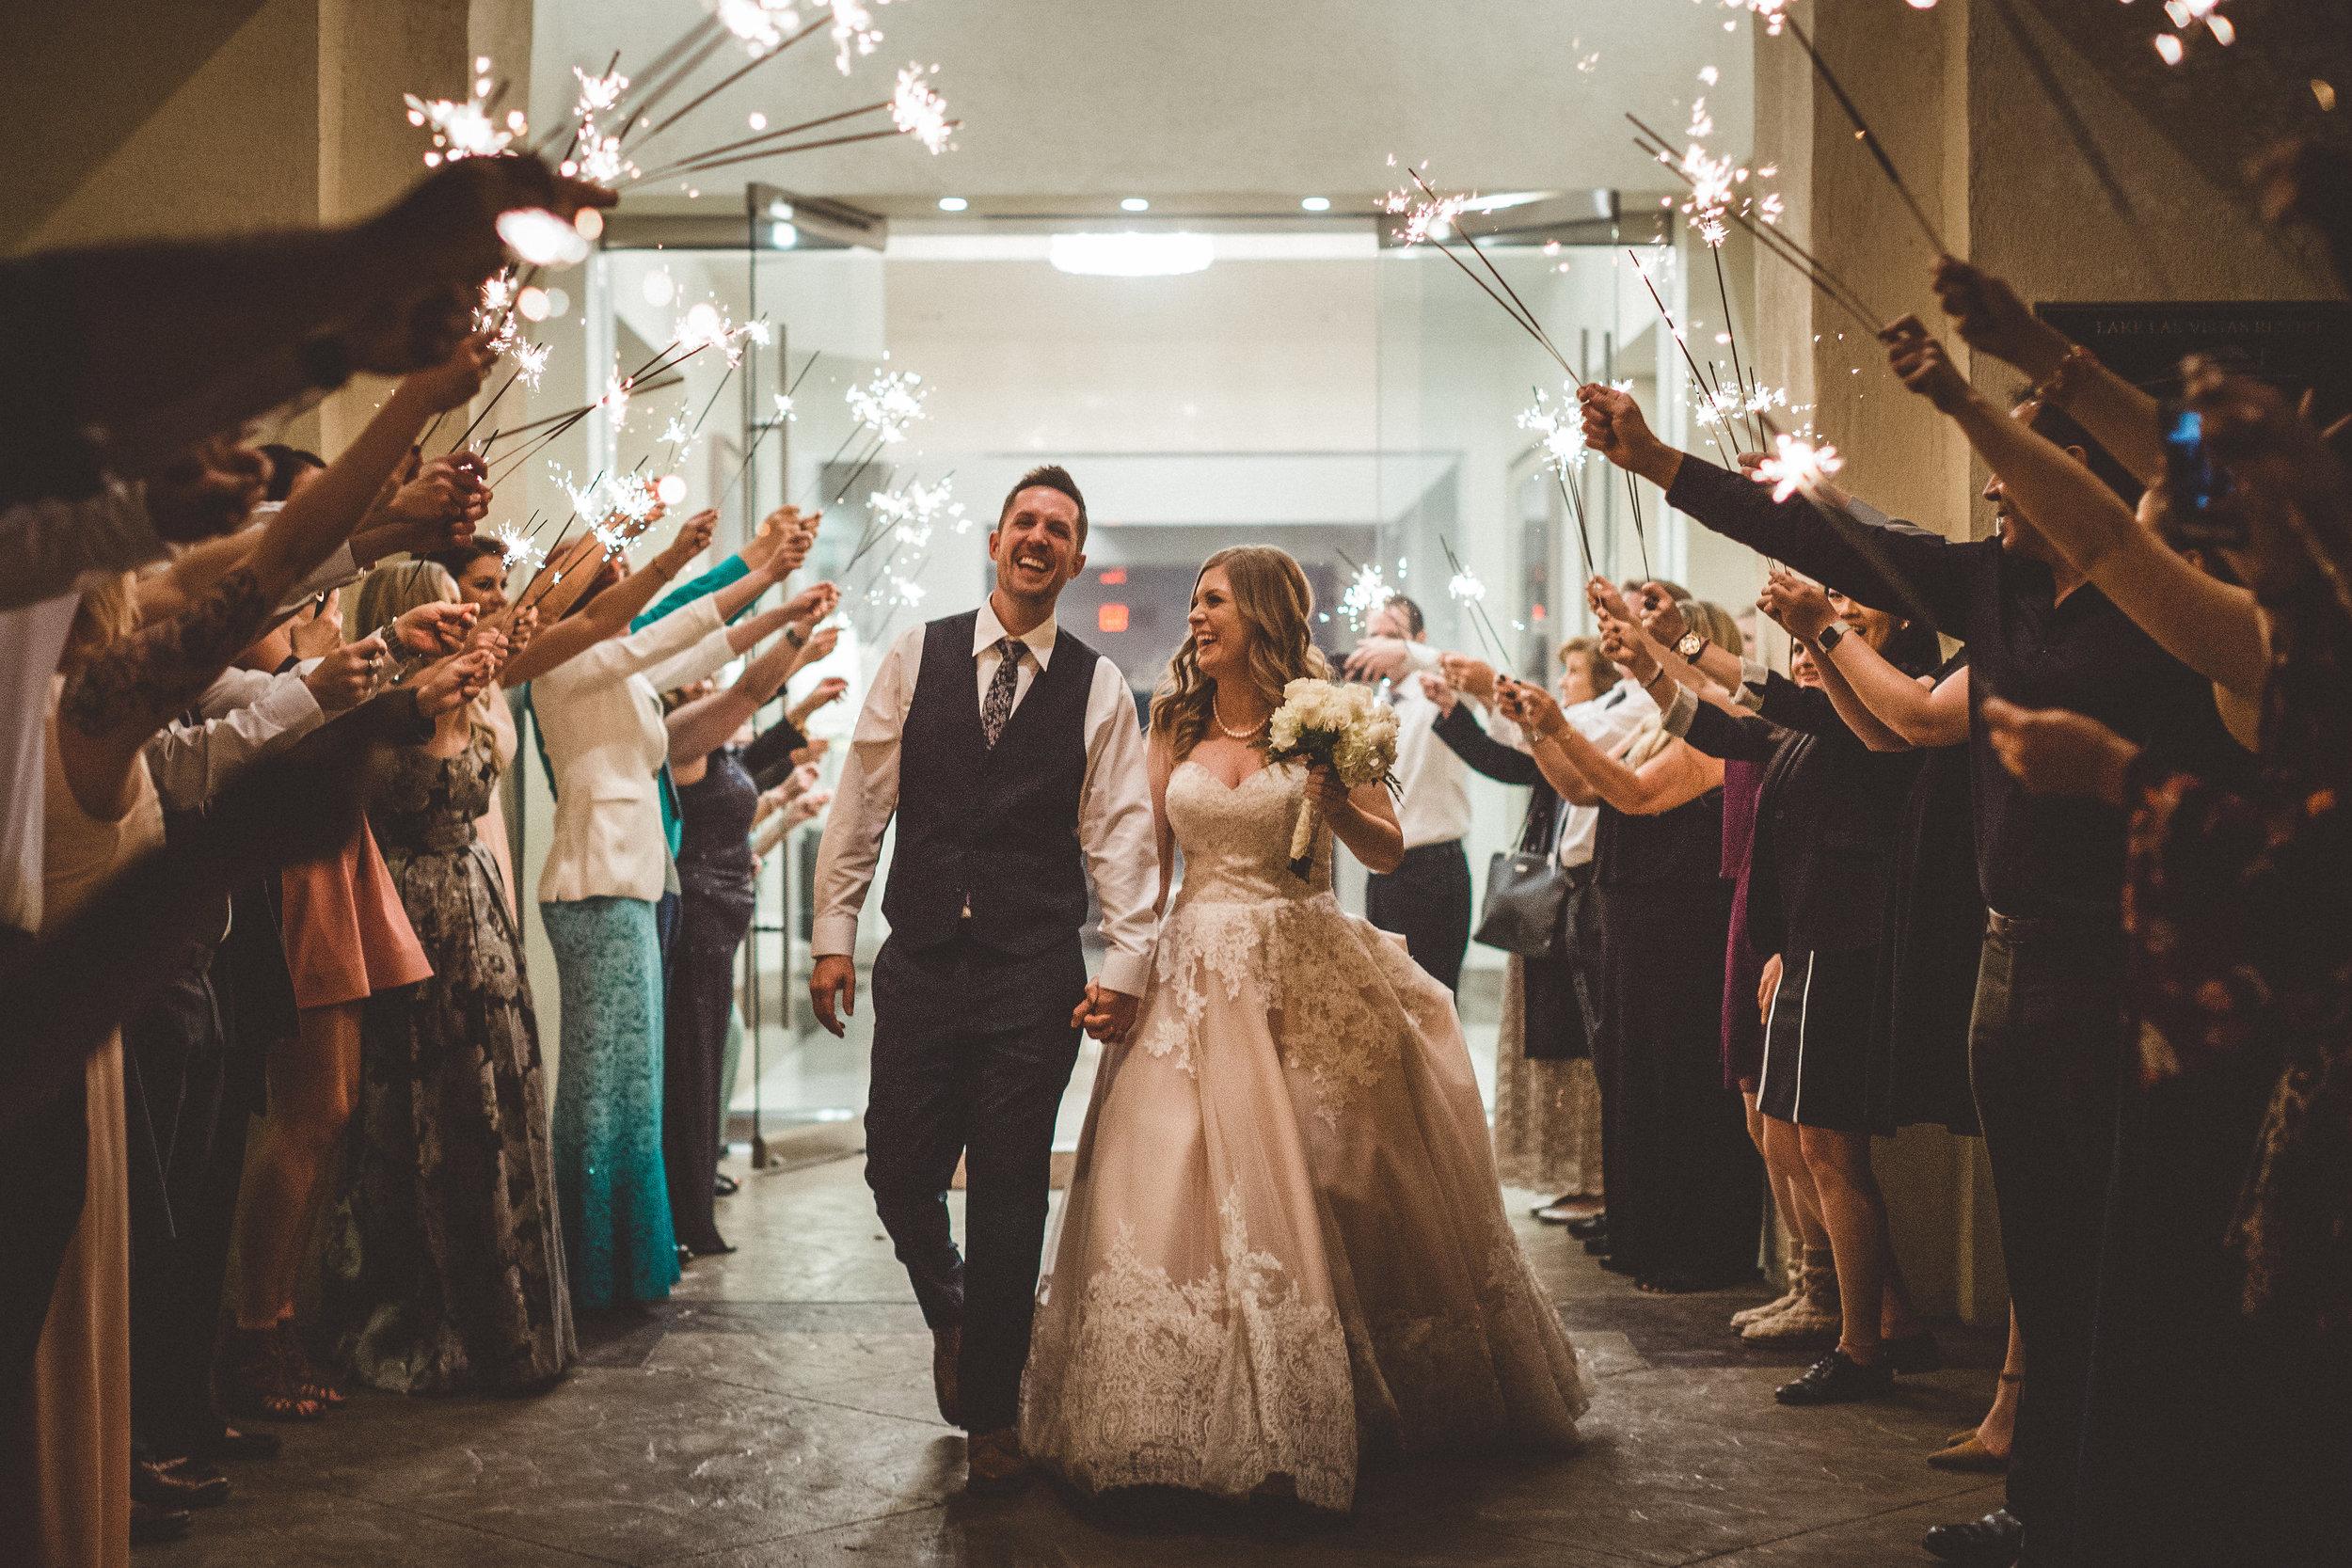 lindsey-and-ryan-intimate-winter-wedding44.jpg